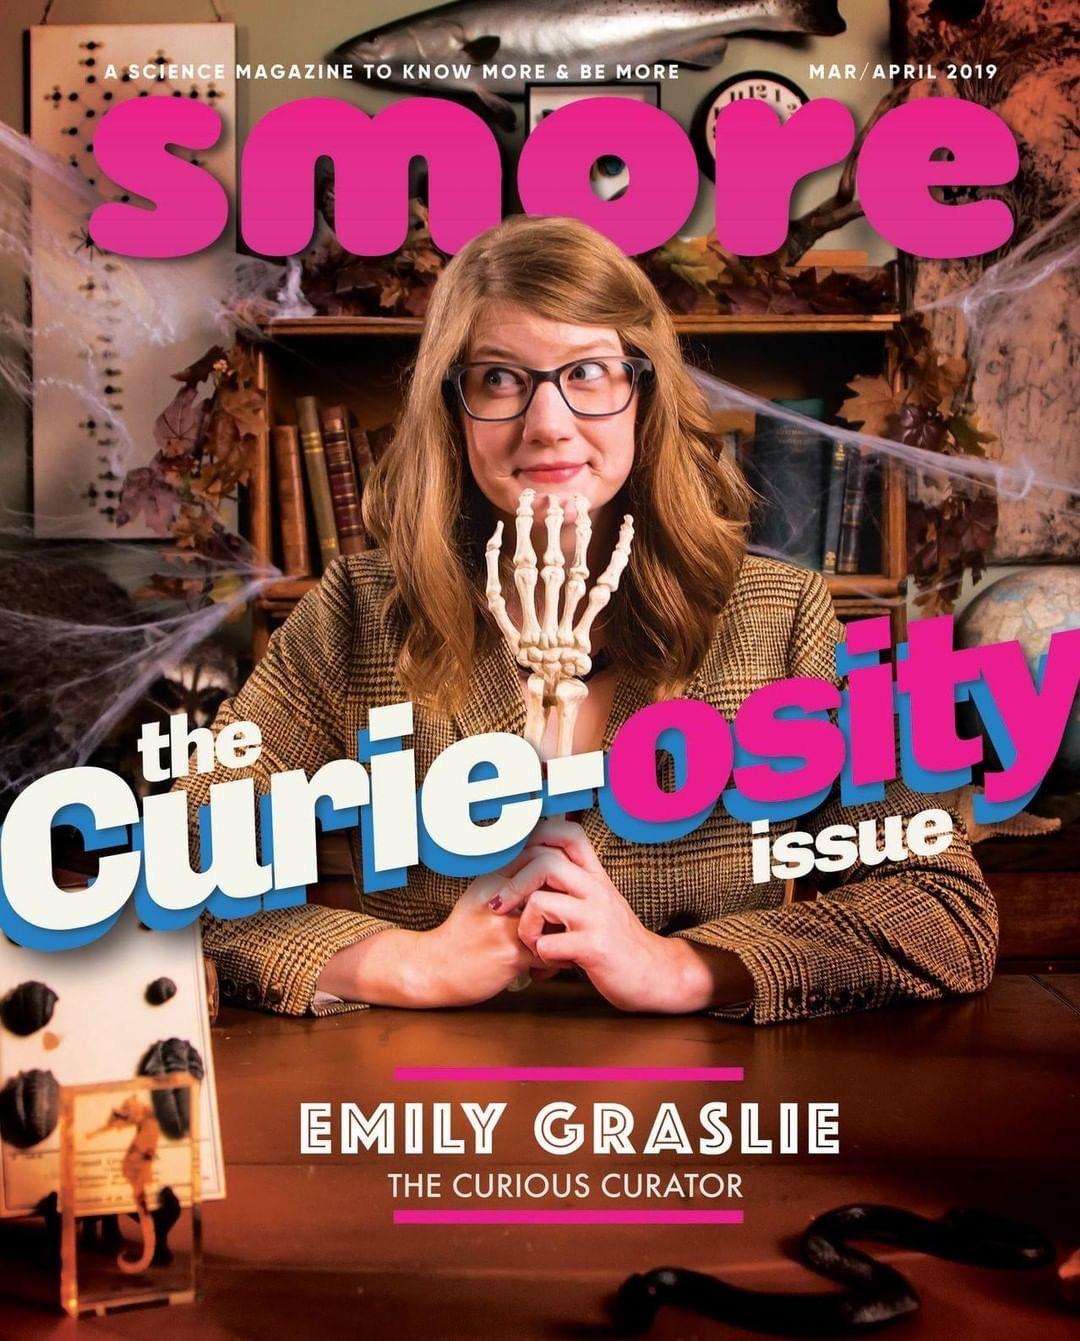 SmoreMagazine cover.JPG